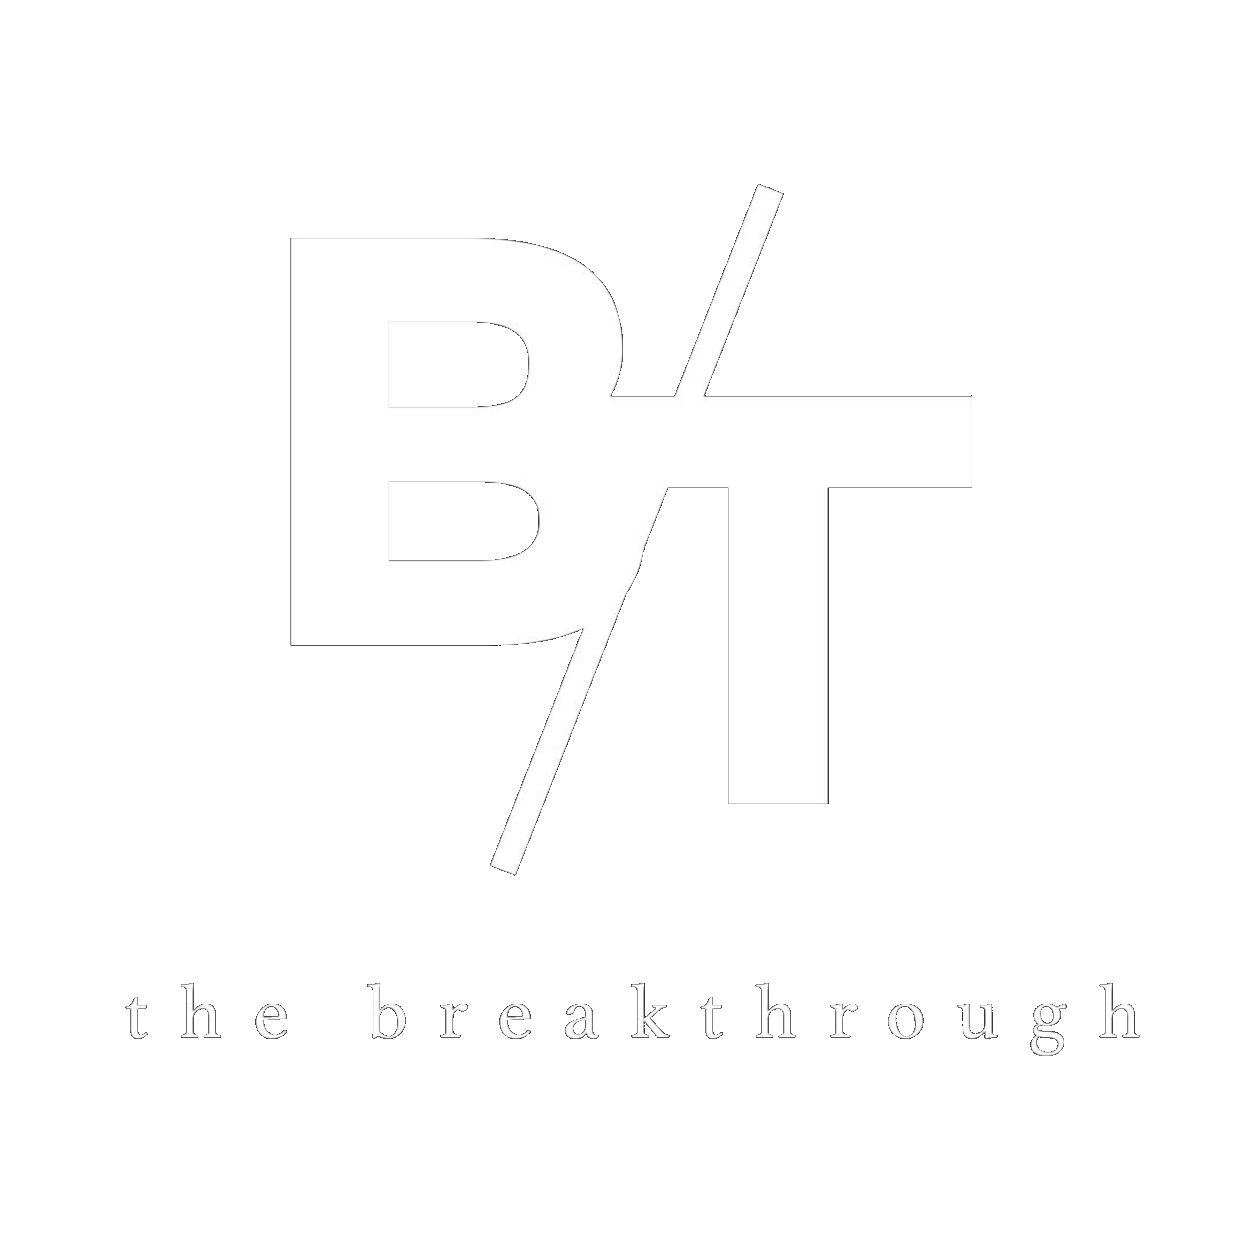 The Breakthrough Official